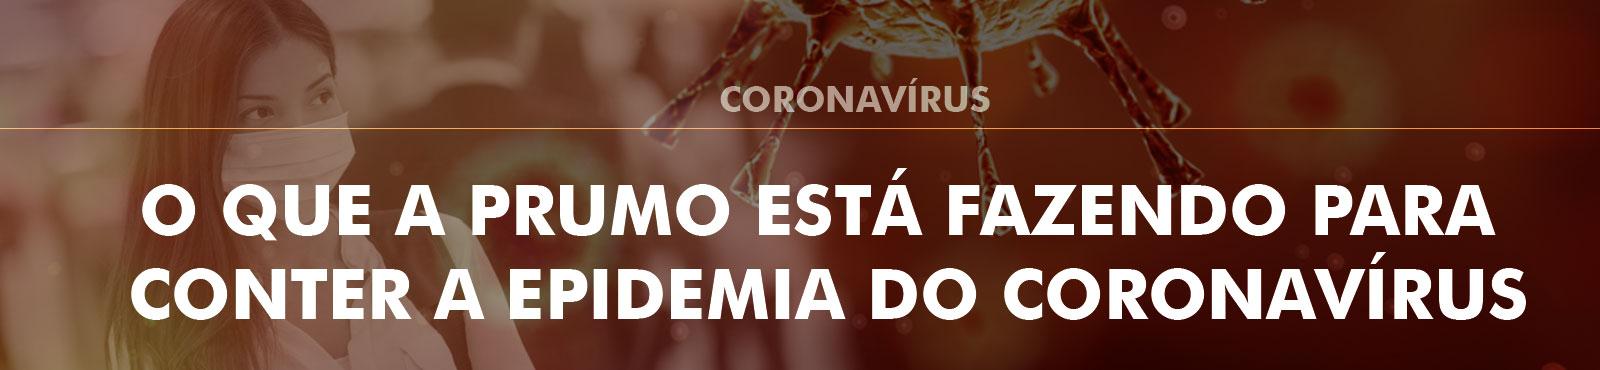 Corona 23 MAR